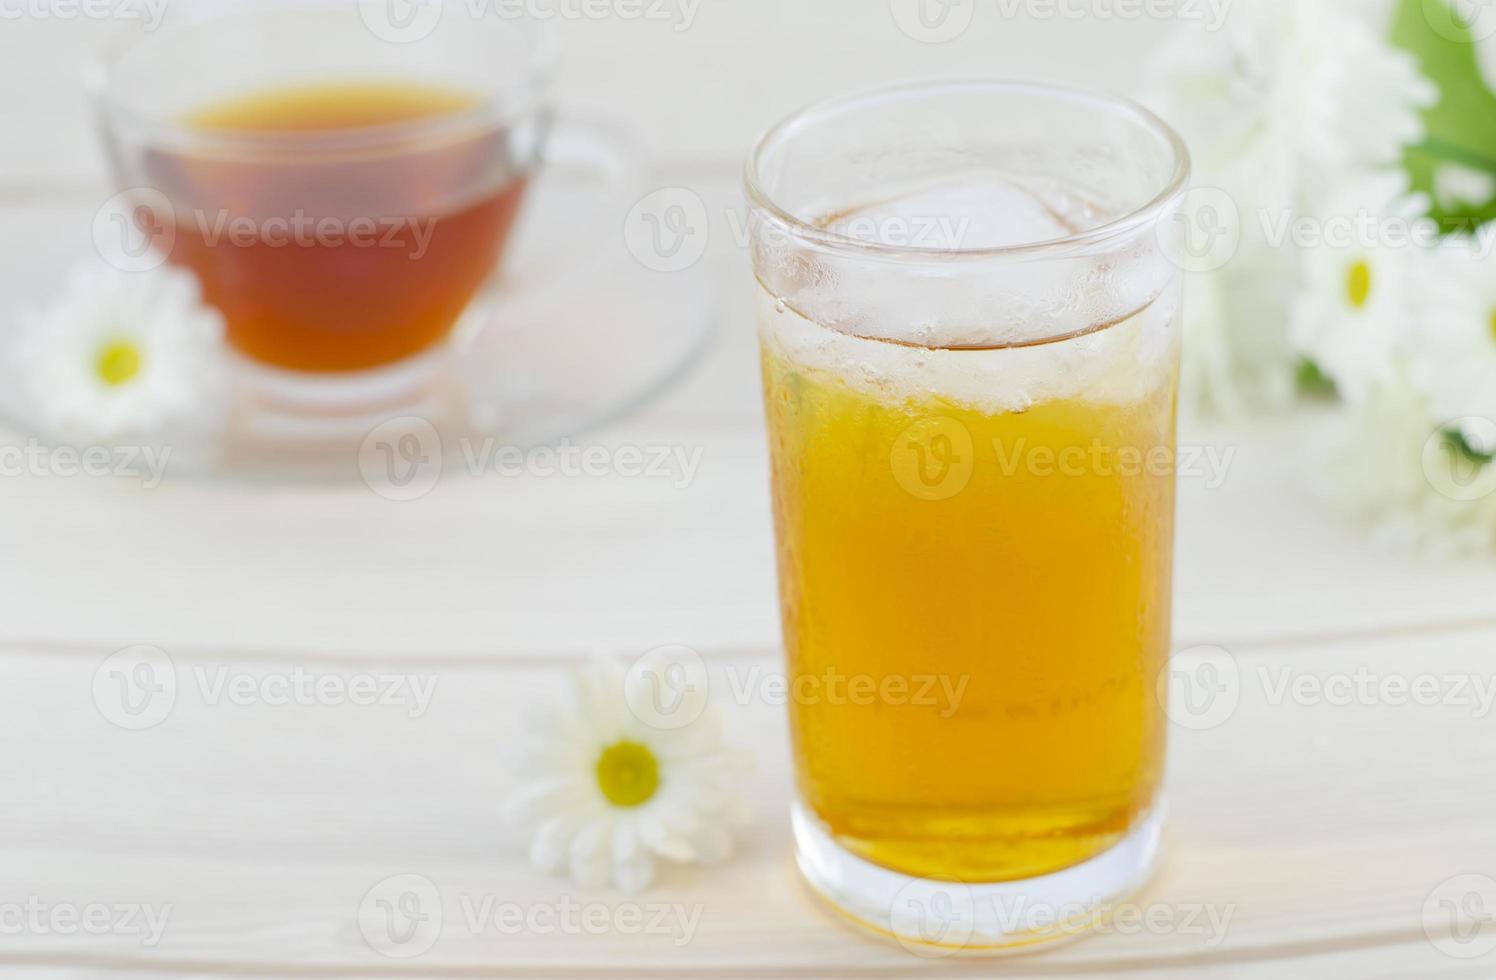 iste, cool drink foto